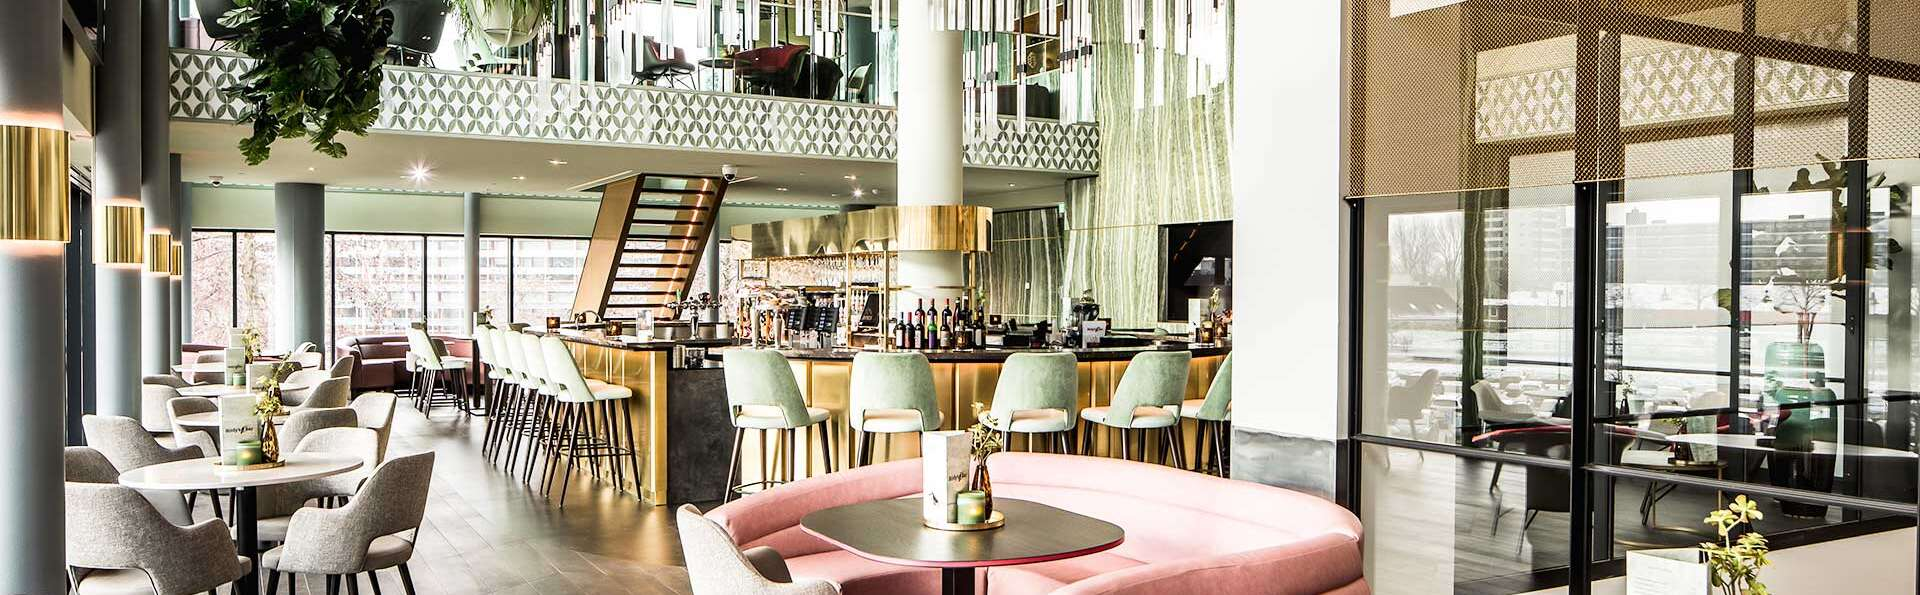 Van der Valk Hotel Haarlem - EDIT_N3_BAR_01.jpg